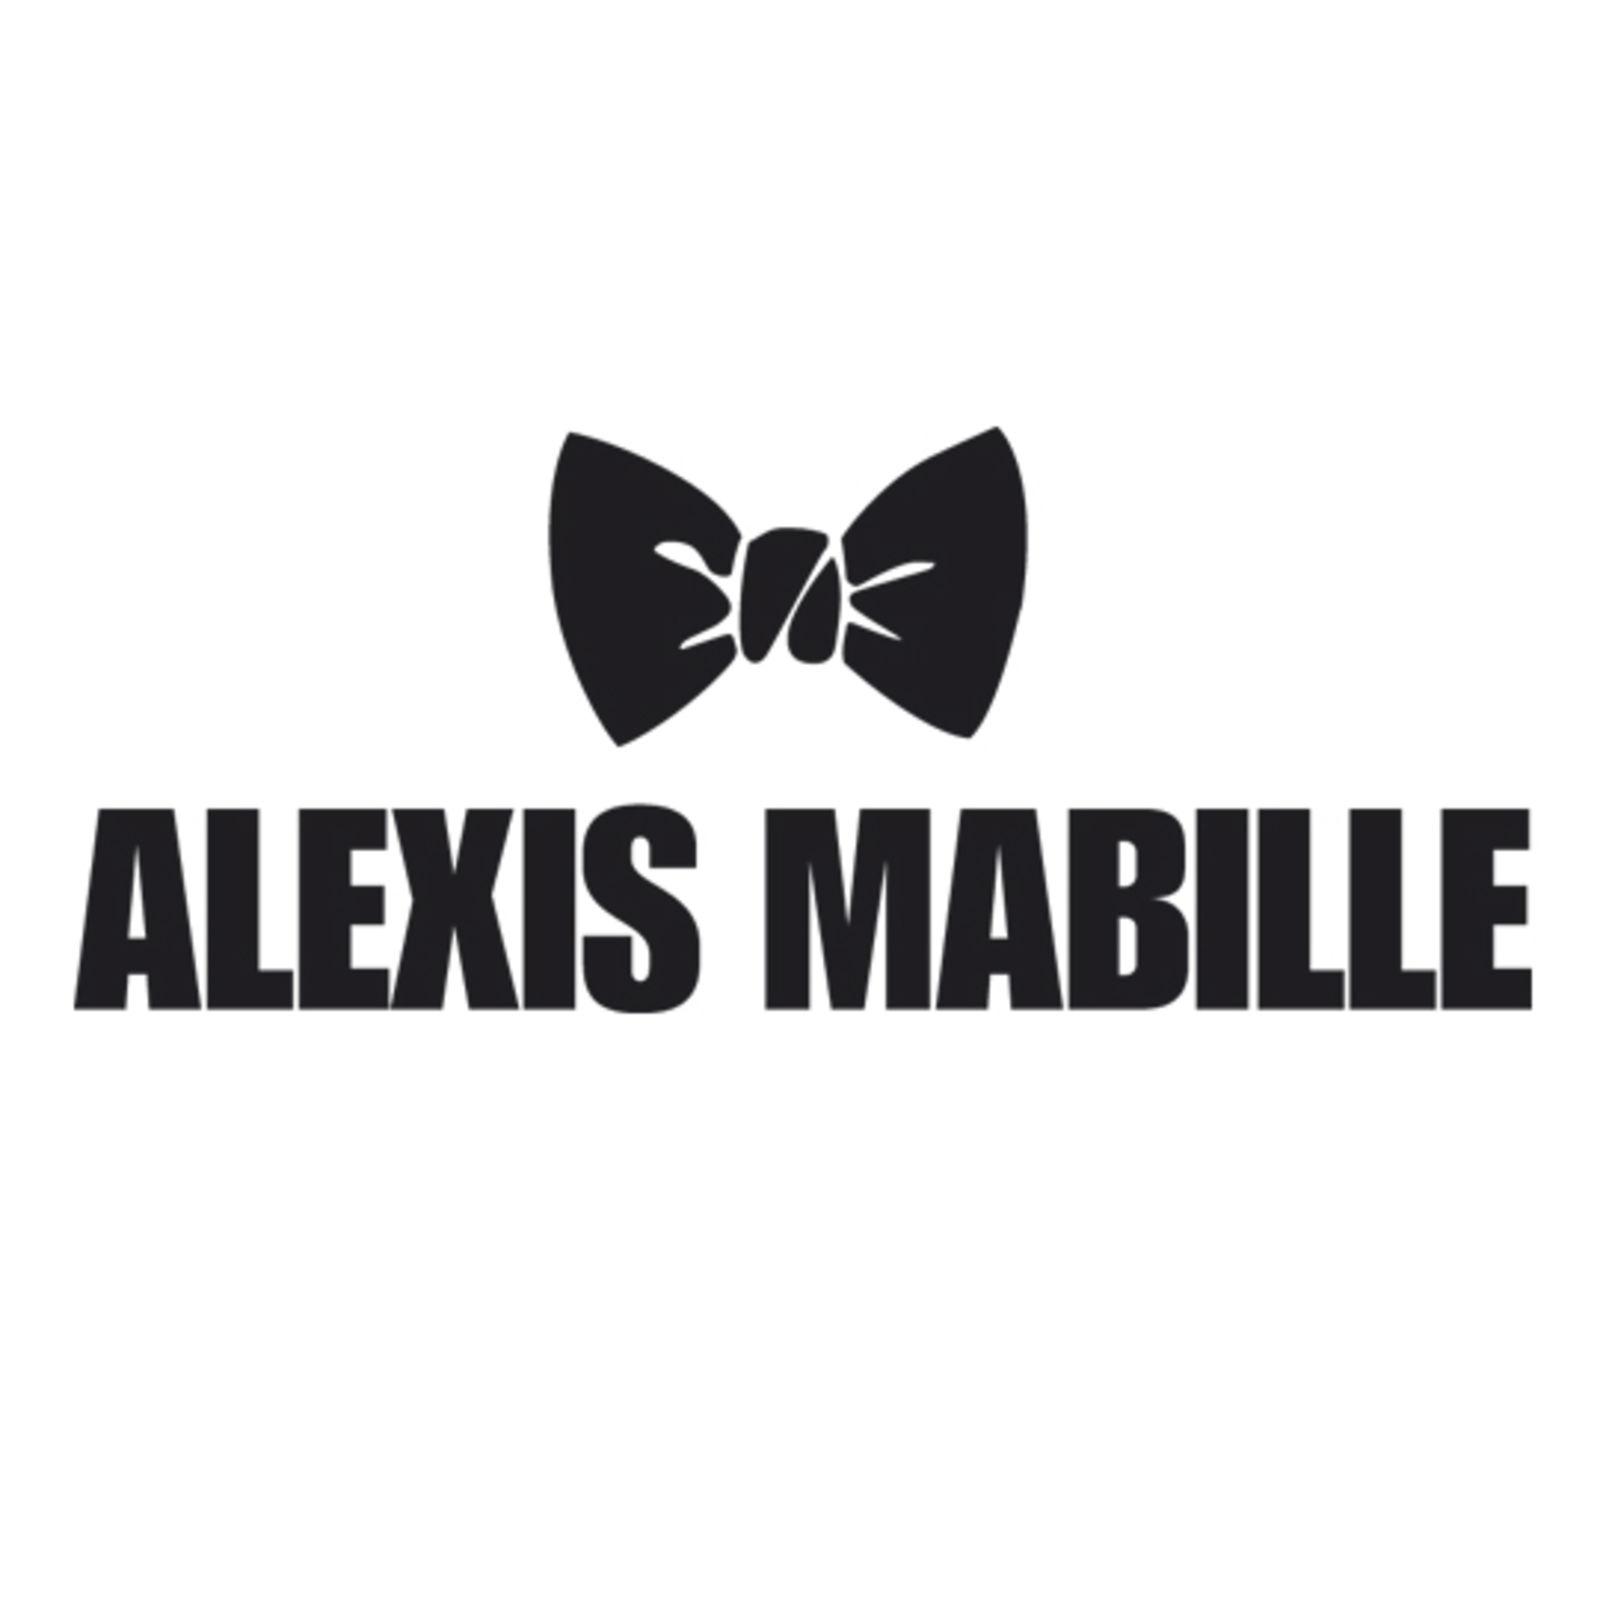 ALEXIS MABILLE (Bild 1)